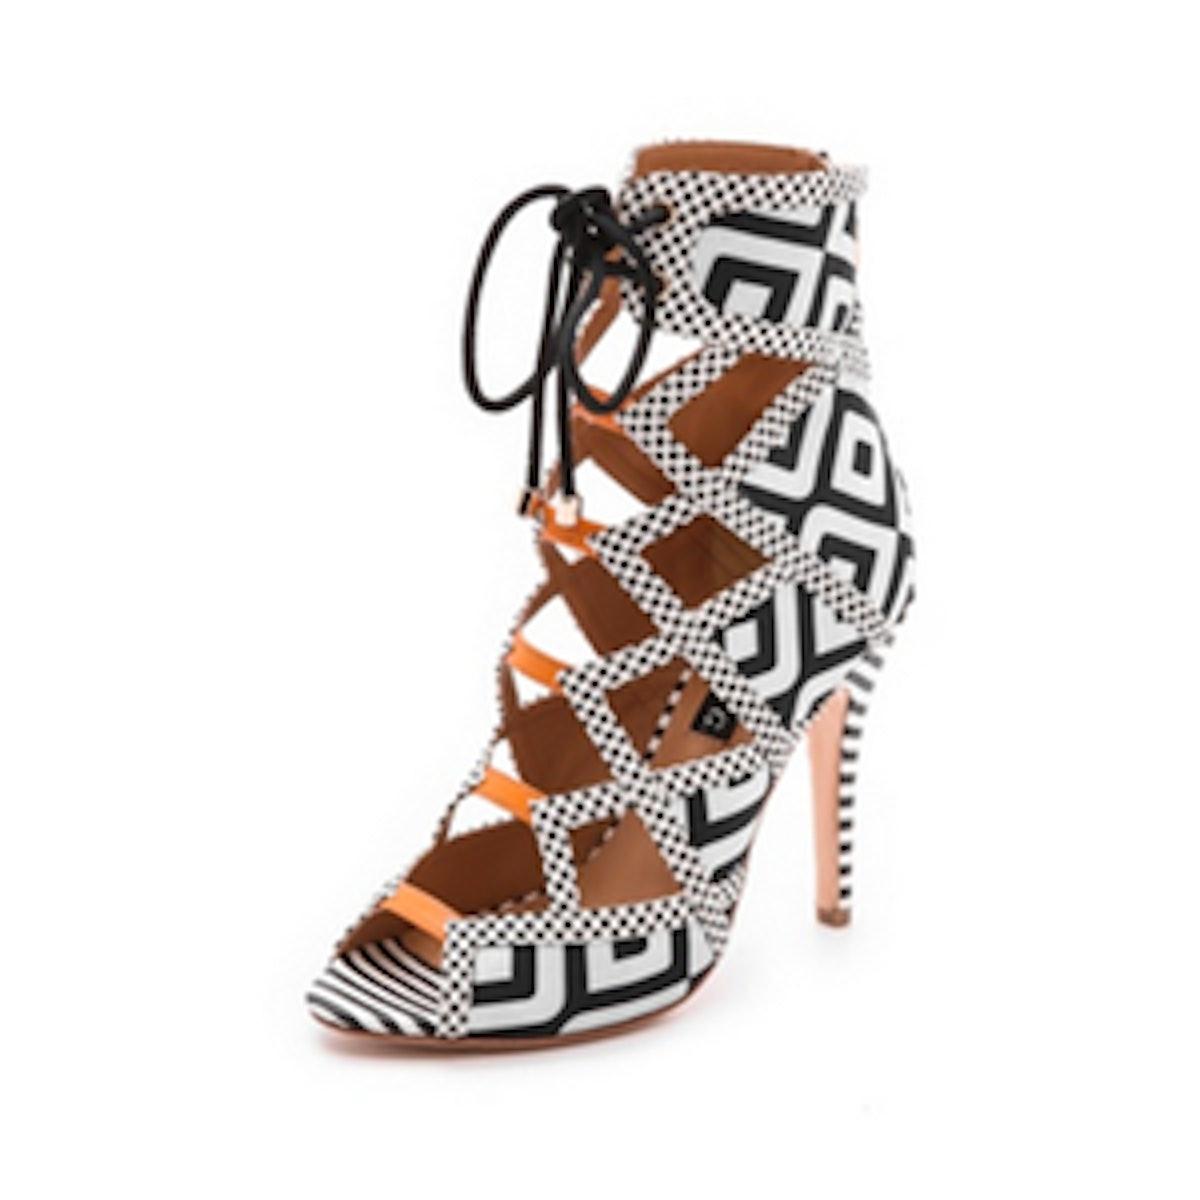 Wanda Lace-Up Sandals